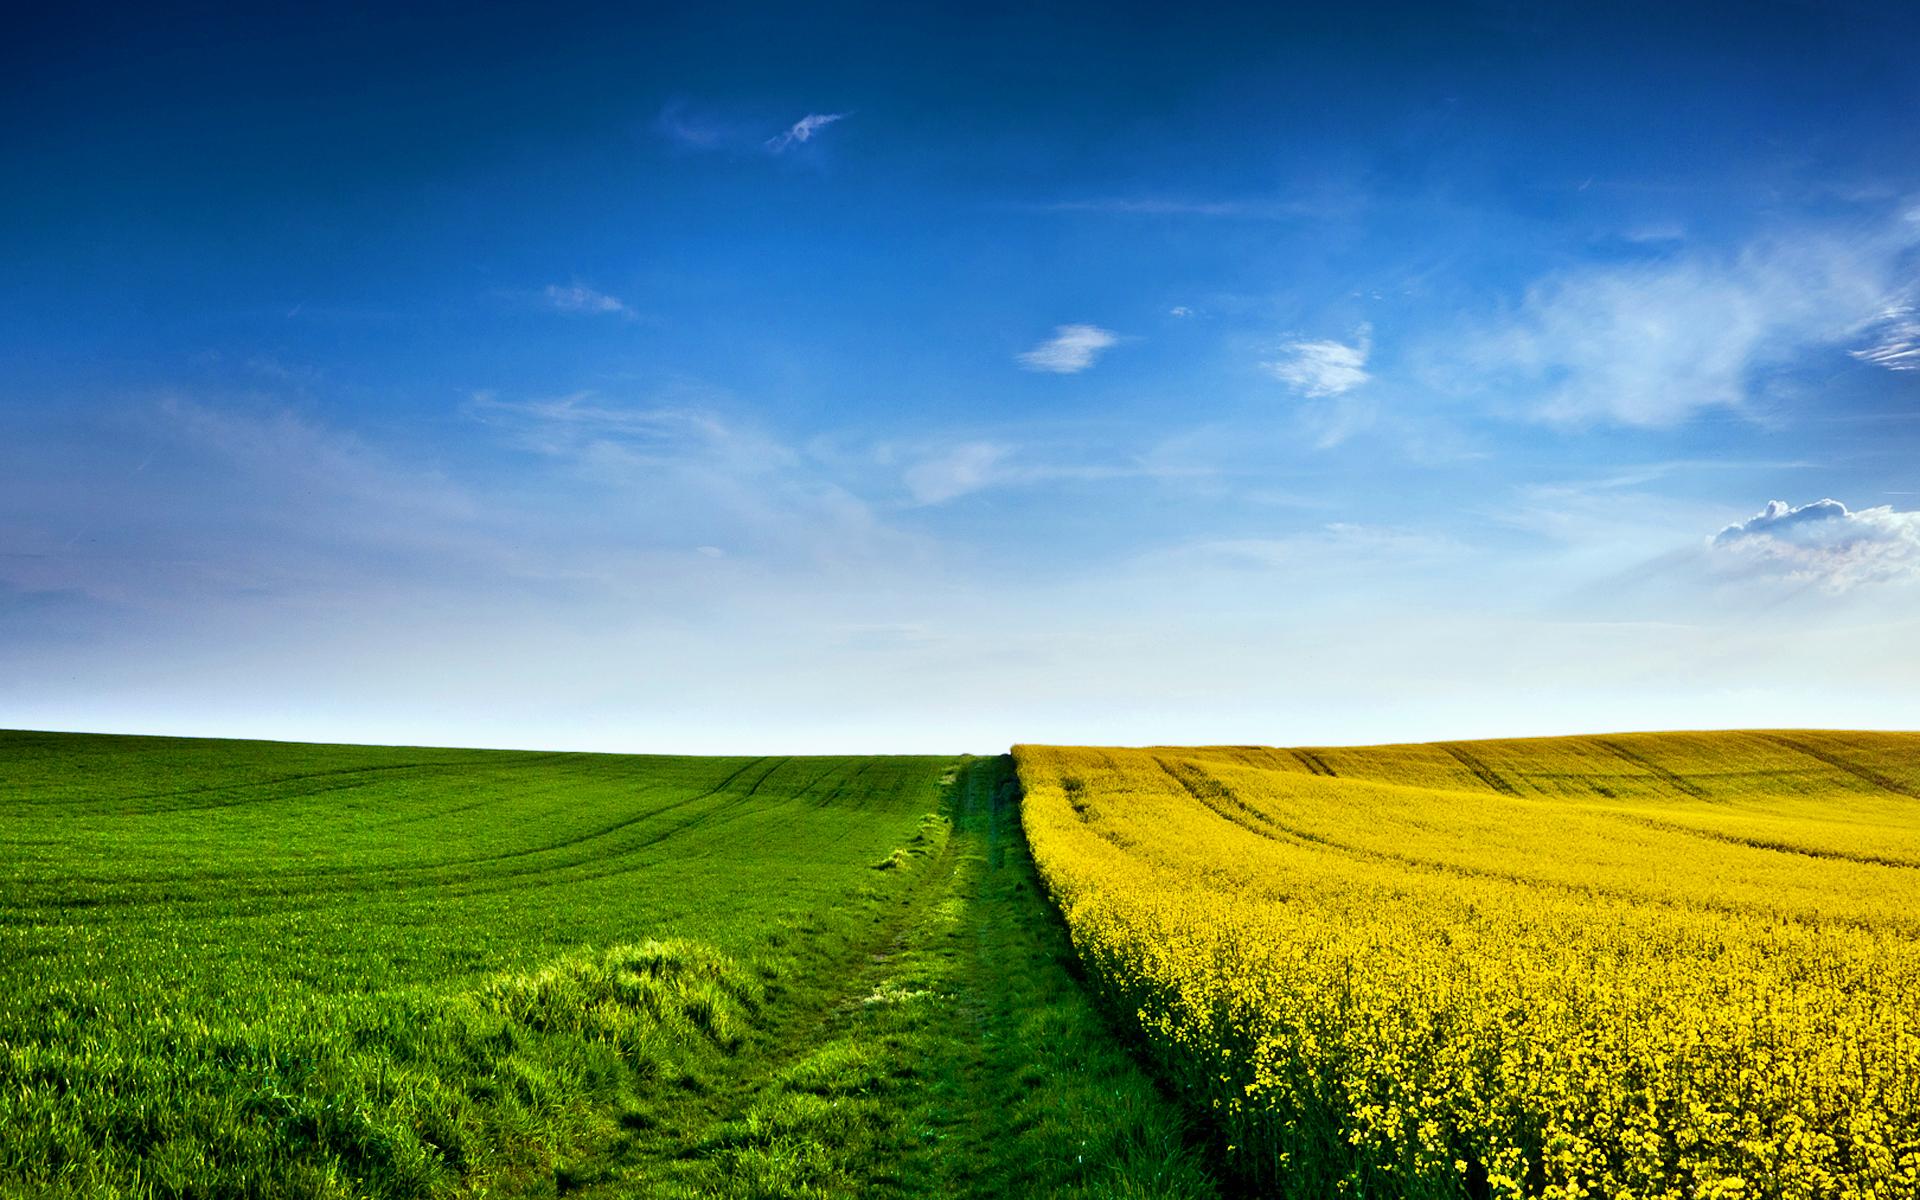 Field Wallpaper; Field Wallpaper; Field Wallpaper ...